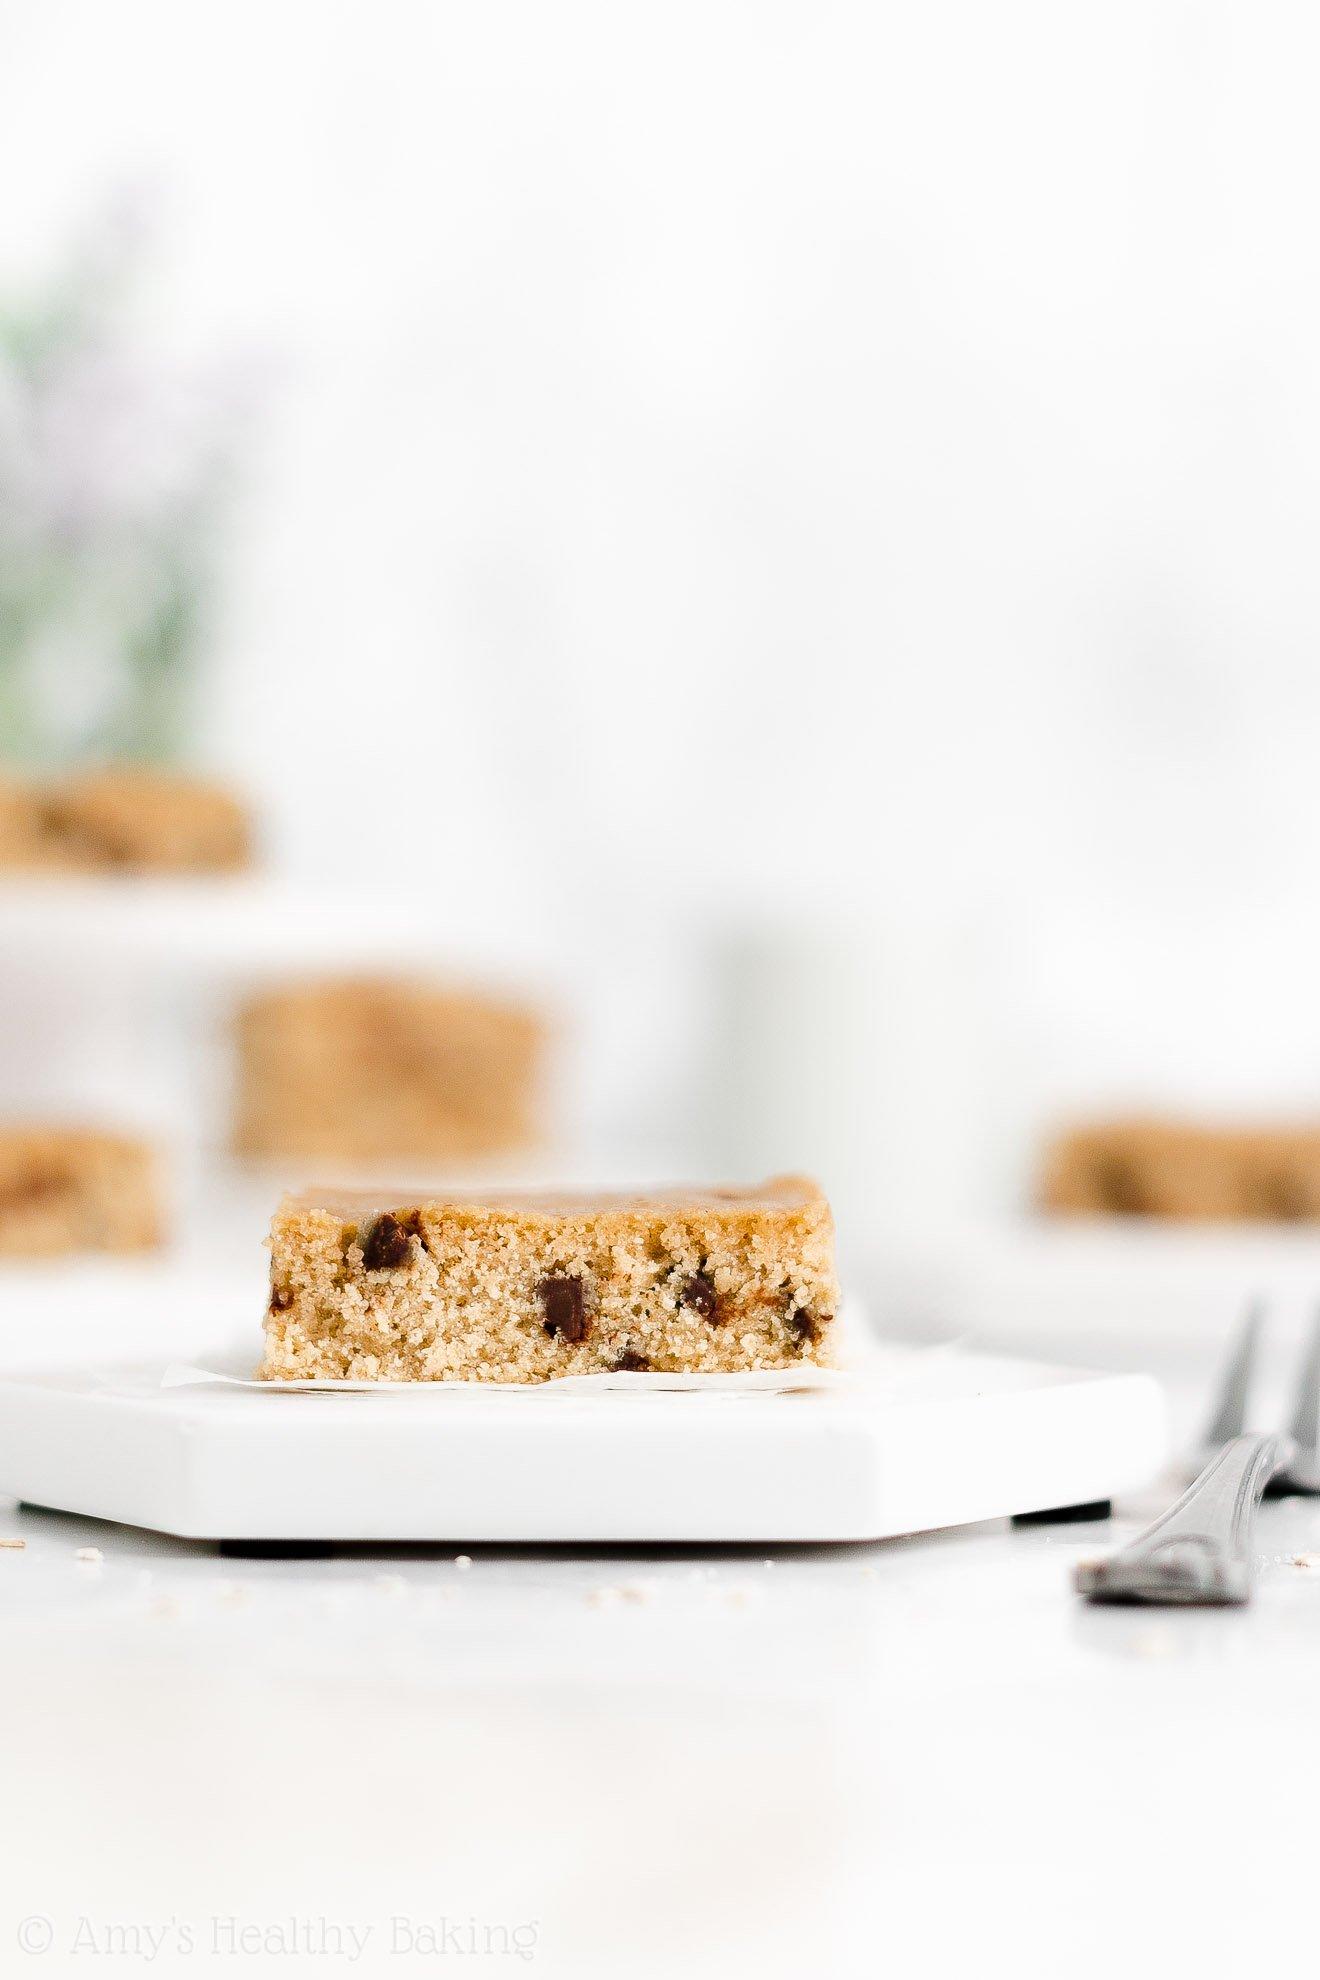 Easy Healthy Gluten Free Dairy Free One Bowl Flourless Chocolate Chip Blondies